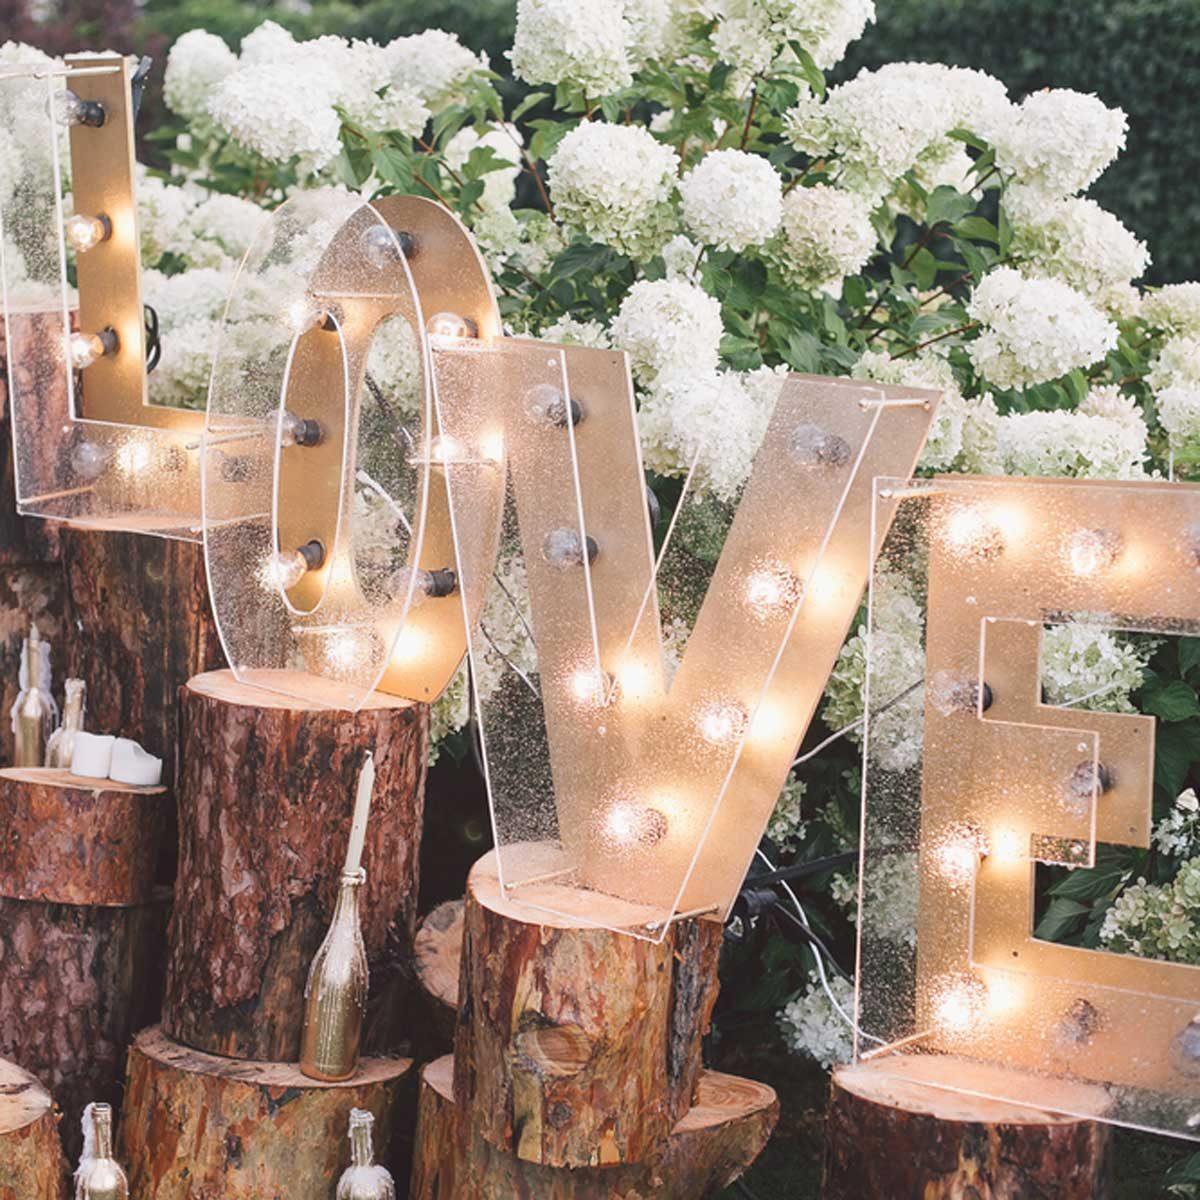 marquee letters wedding love garden wedding decorations